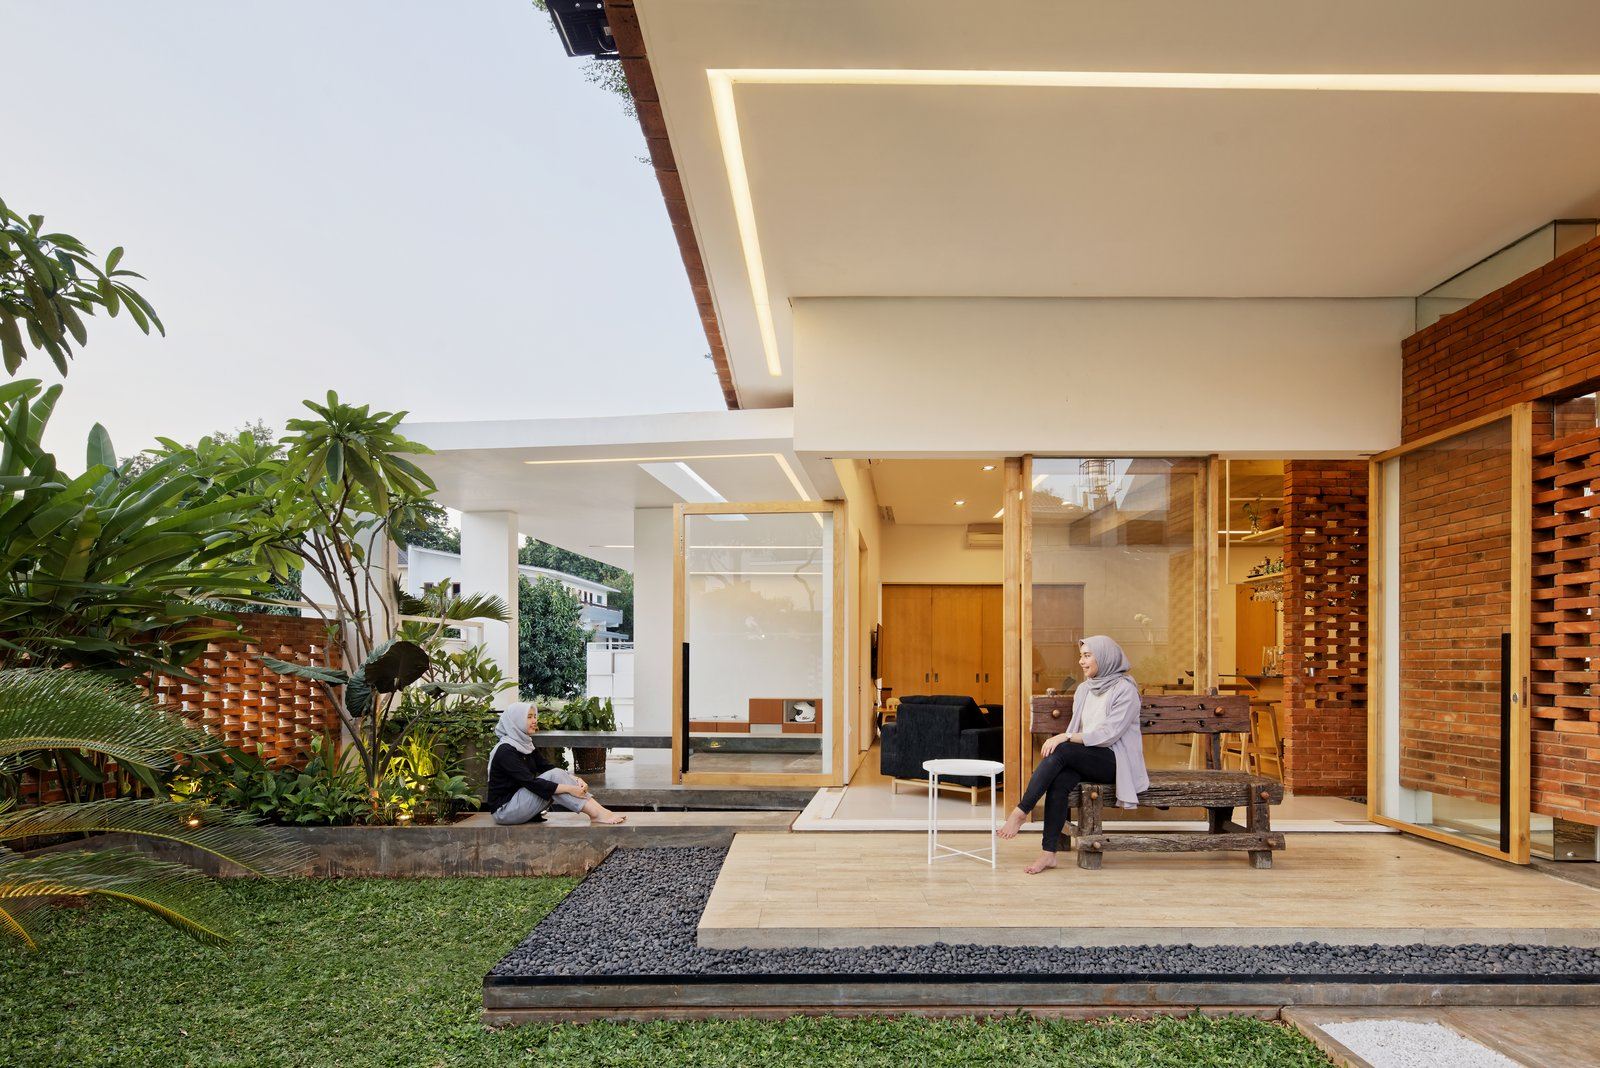 Flick House Delution Indonesia Green Architecture Garden